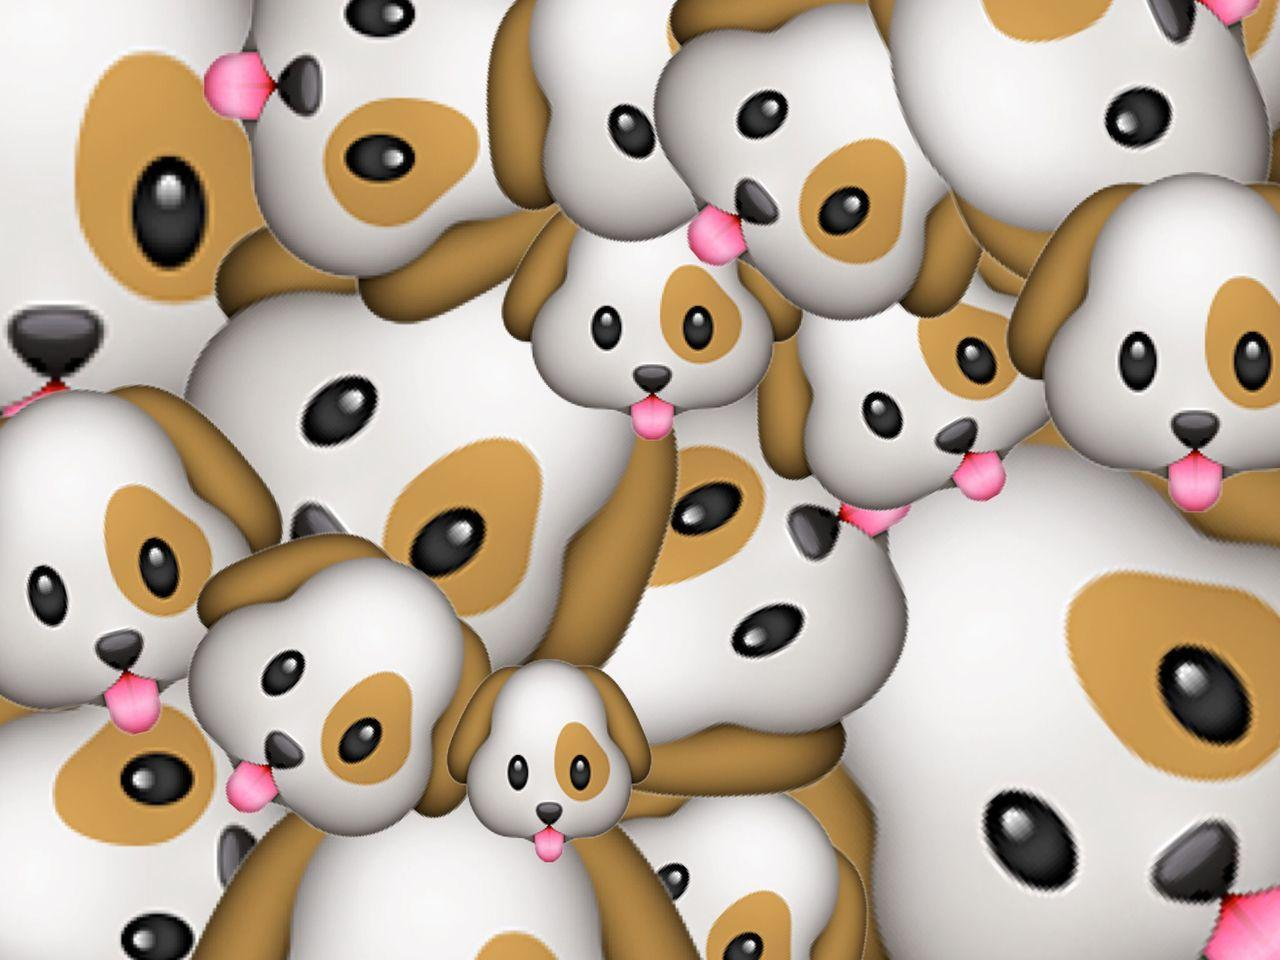 animals emoji wallpaper - photo #5